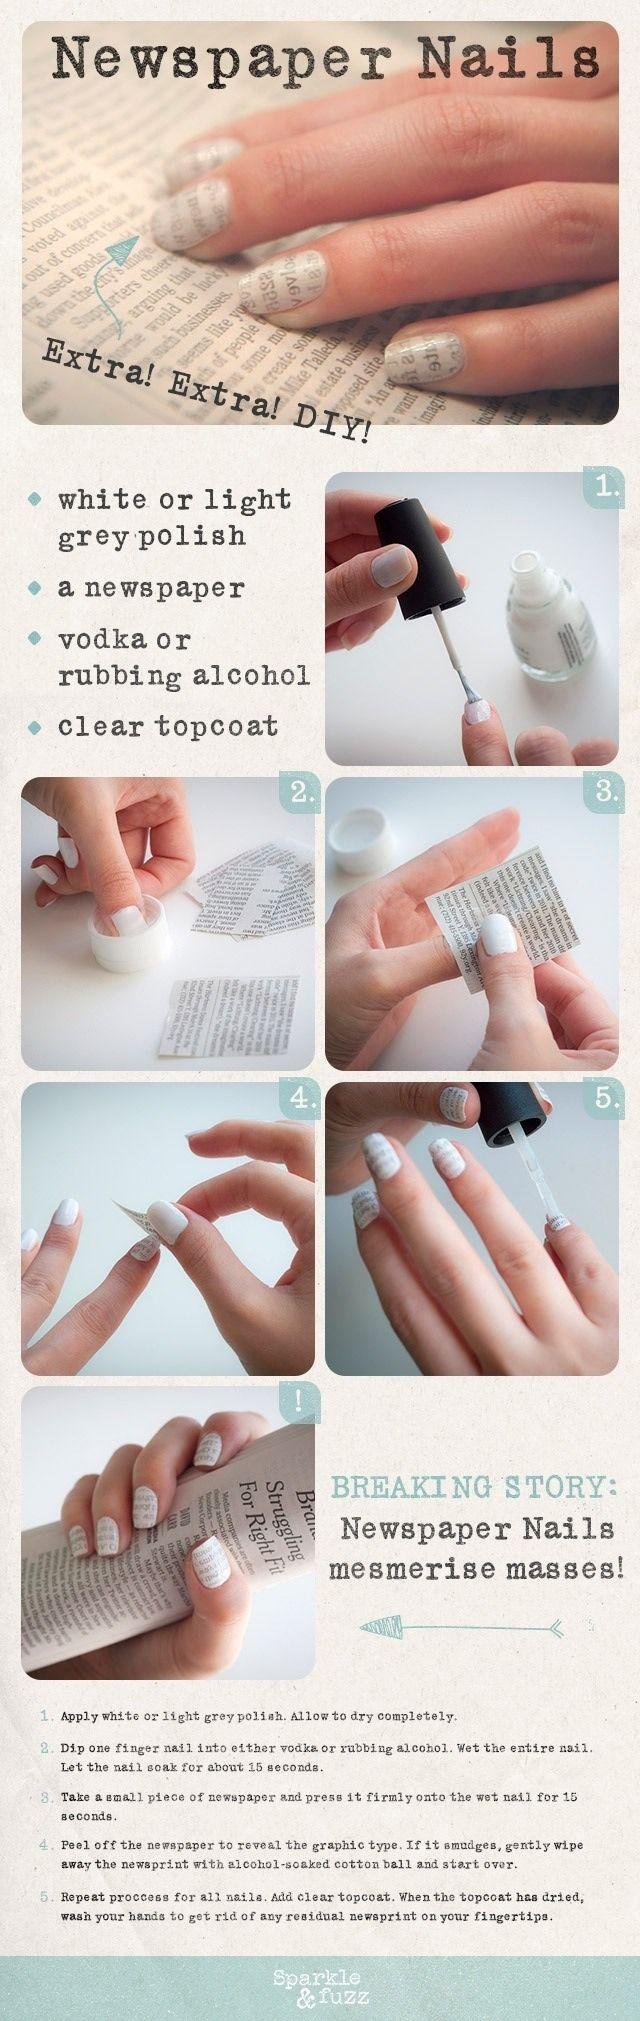 Newspaper Nails |Nail design | Unhas Decorada | Unhas com Efeito de Jornal | Nail Polish | Fancy | Chic | Elegante | Tutorial Nail Art